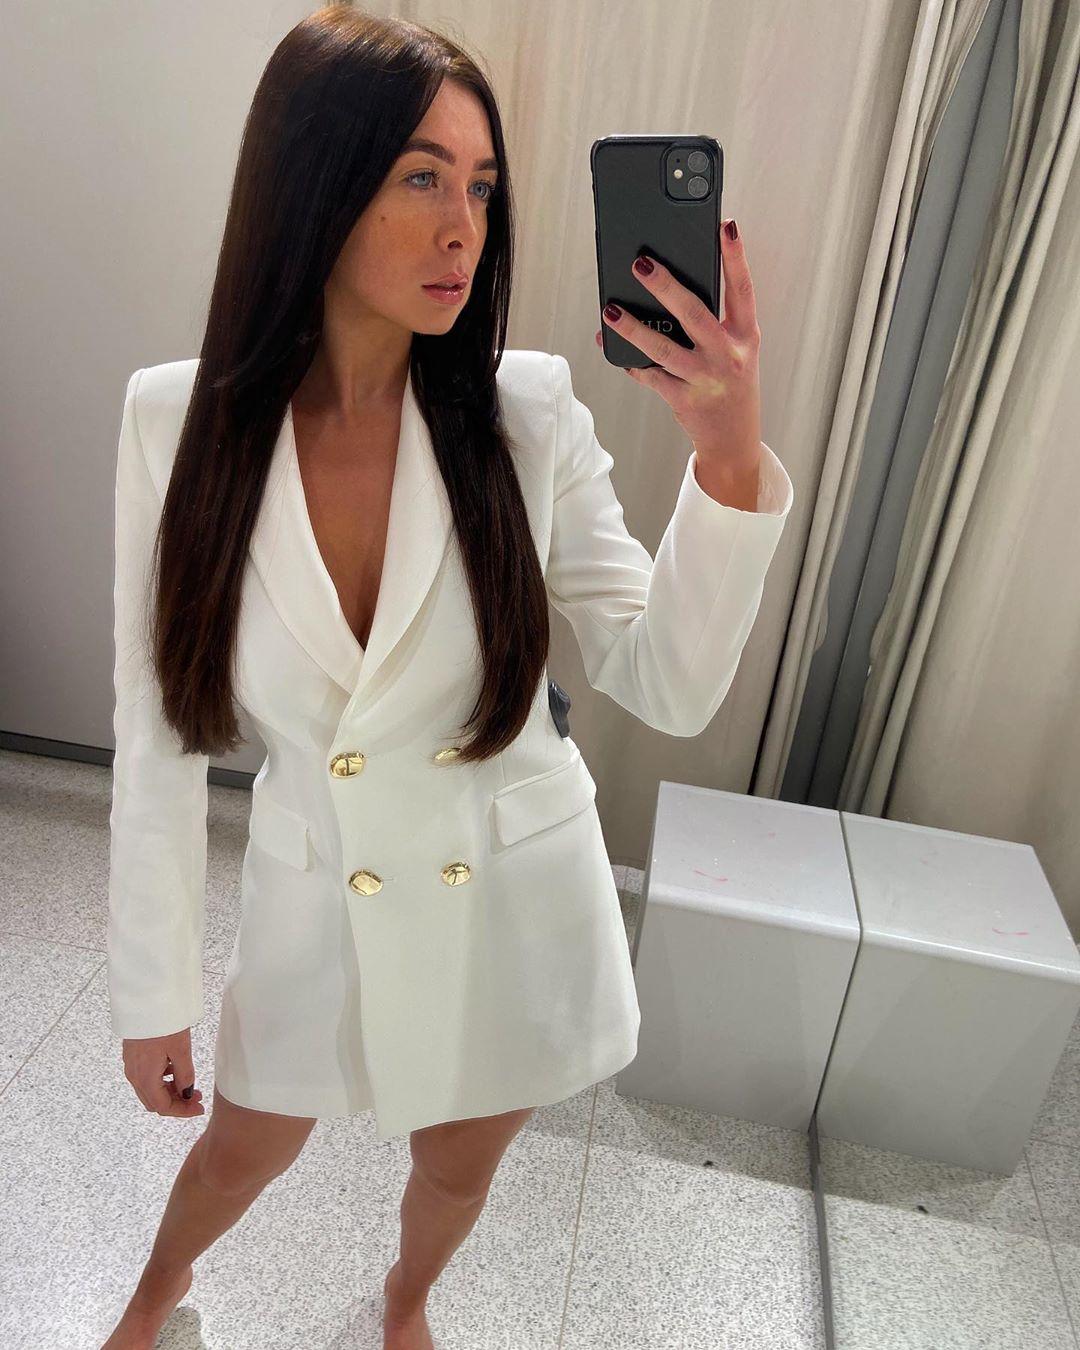 cross breasted long jacket de Zara sur courtbyafeather